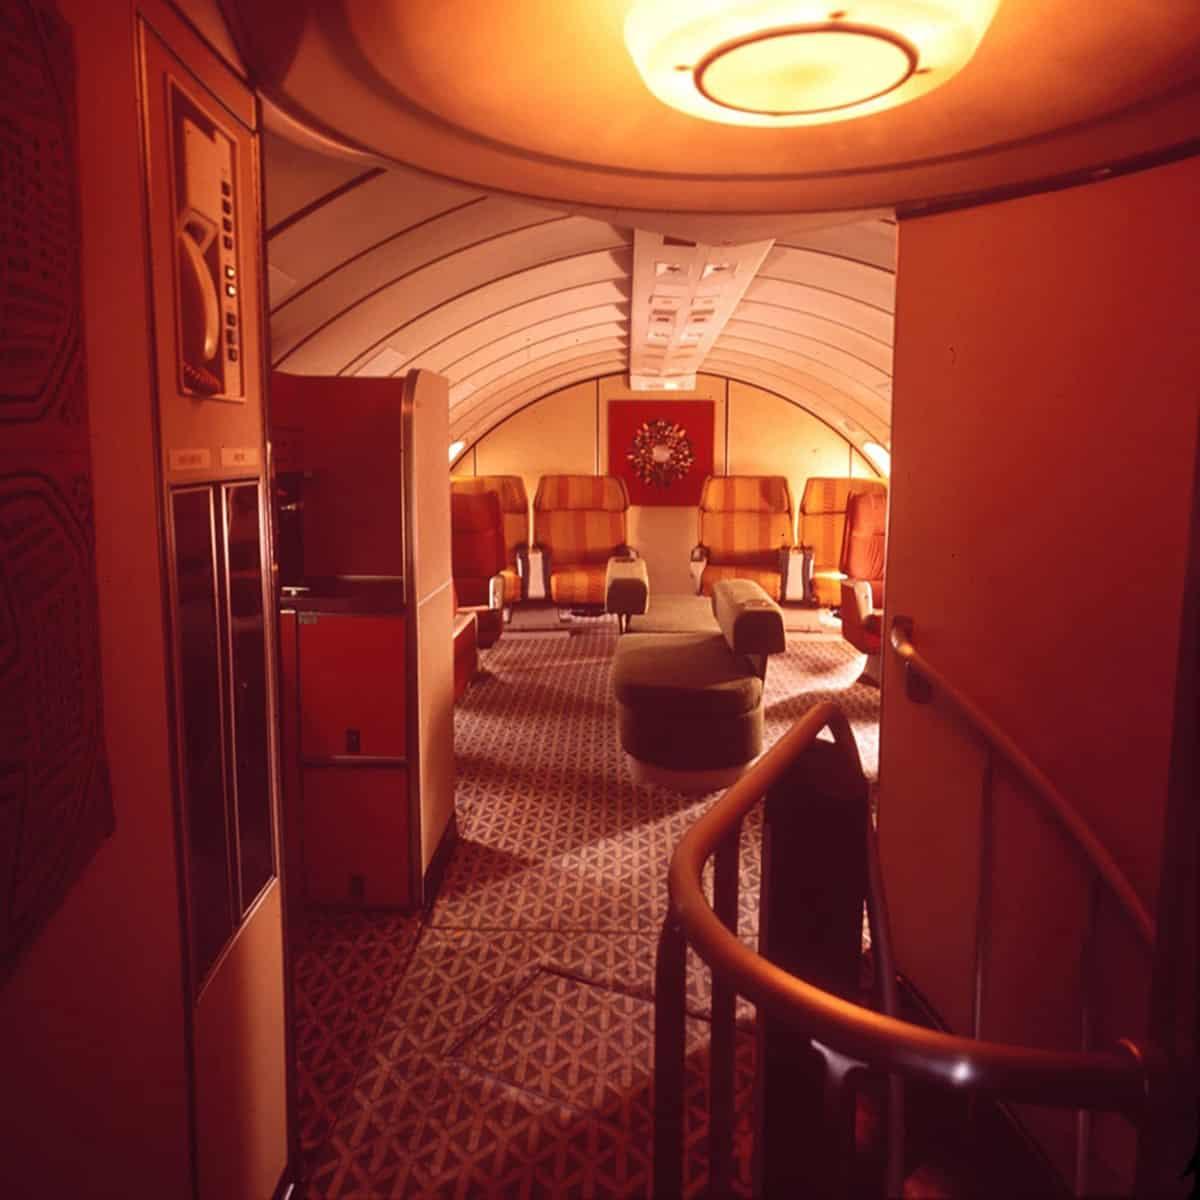 Braniff's Boeing 747First Class Upper Deck